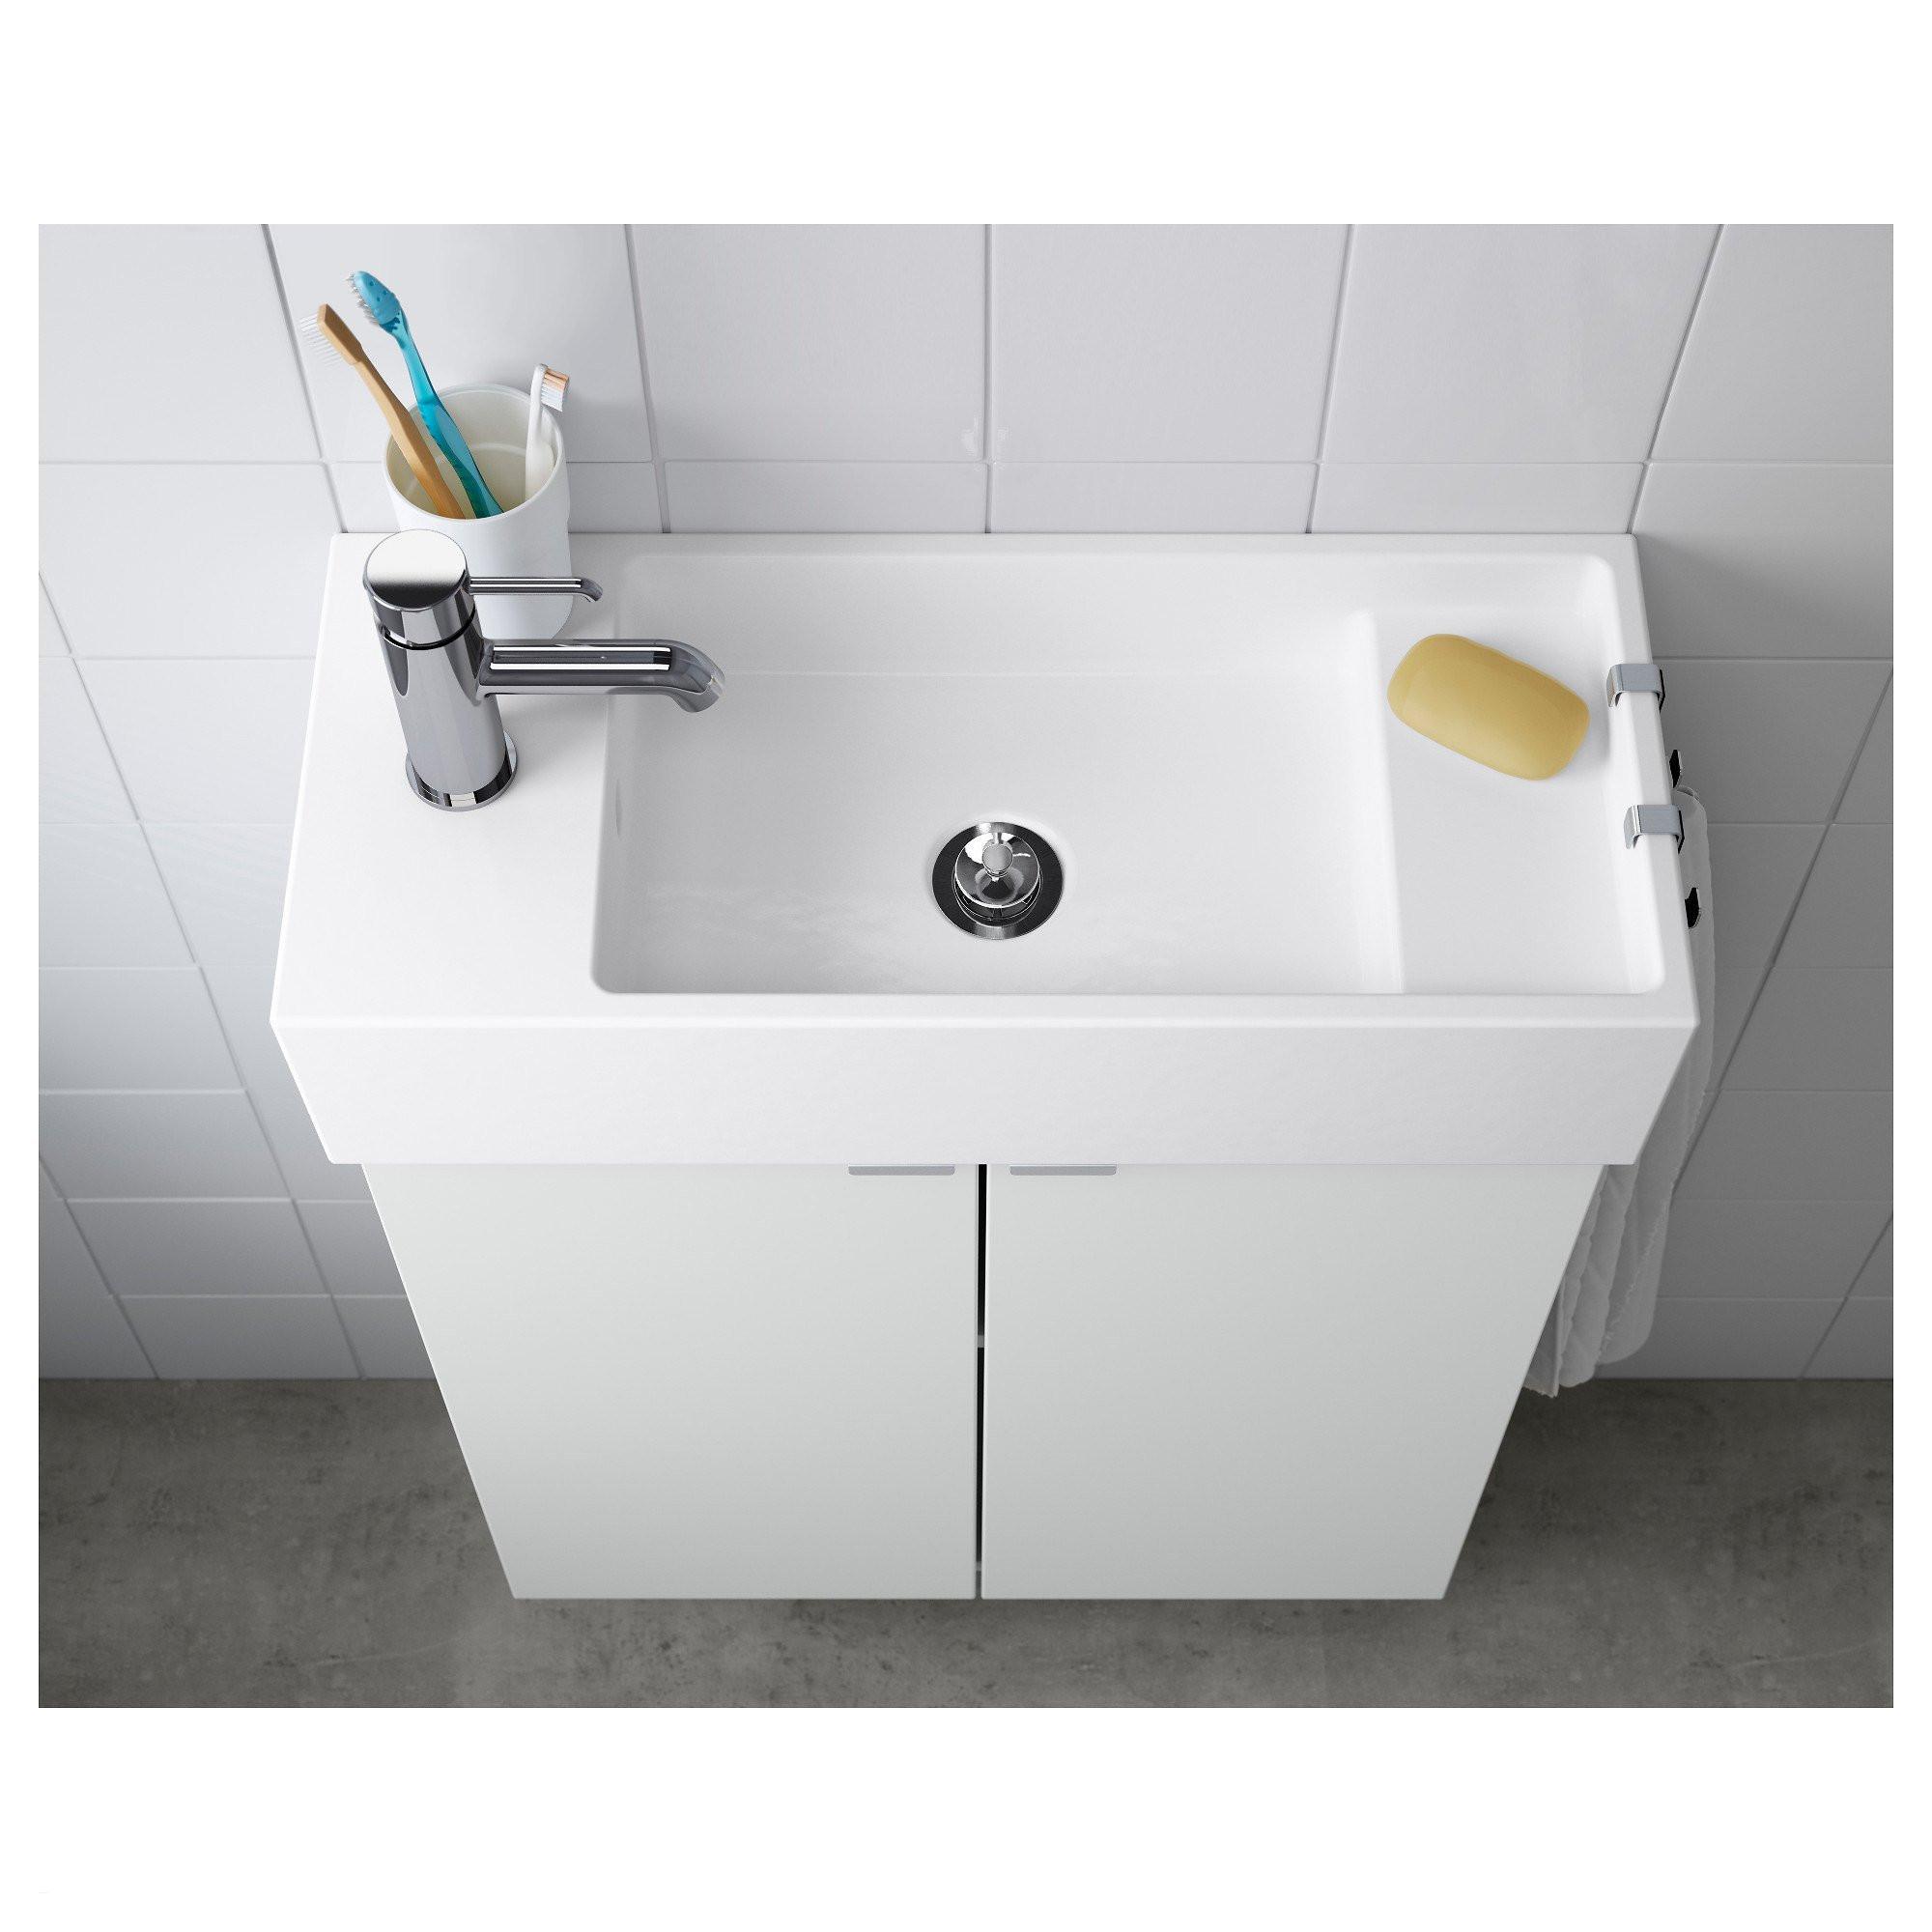 Meuble Salle De Bains Ikea Inspirant Images Ikea Accessoires Salle De Bain Meilleur De Ikea Bathroom Storage